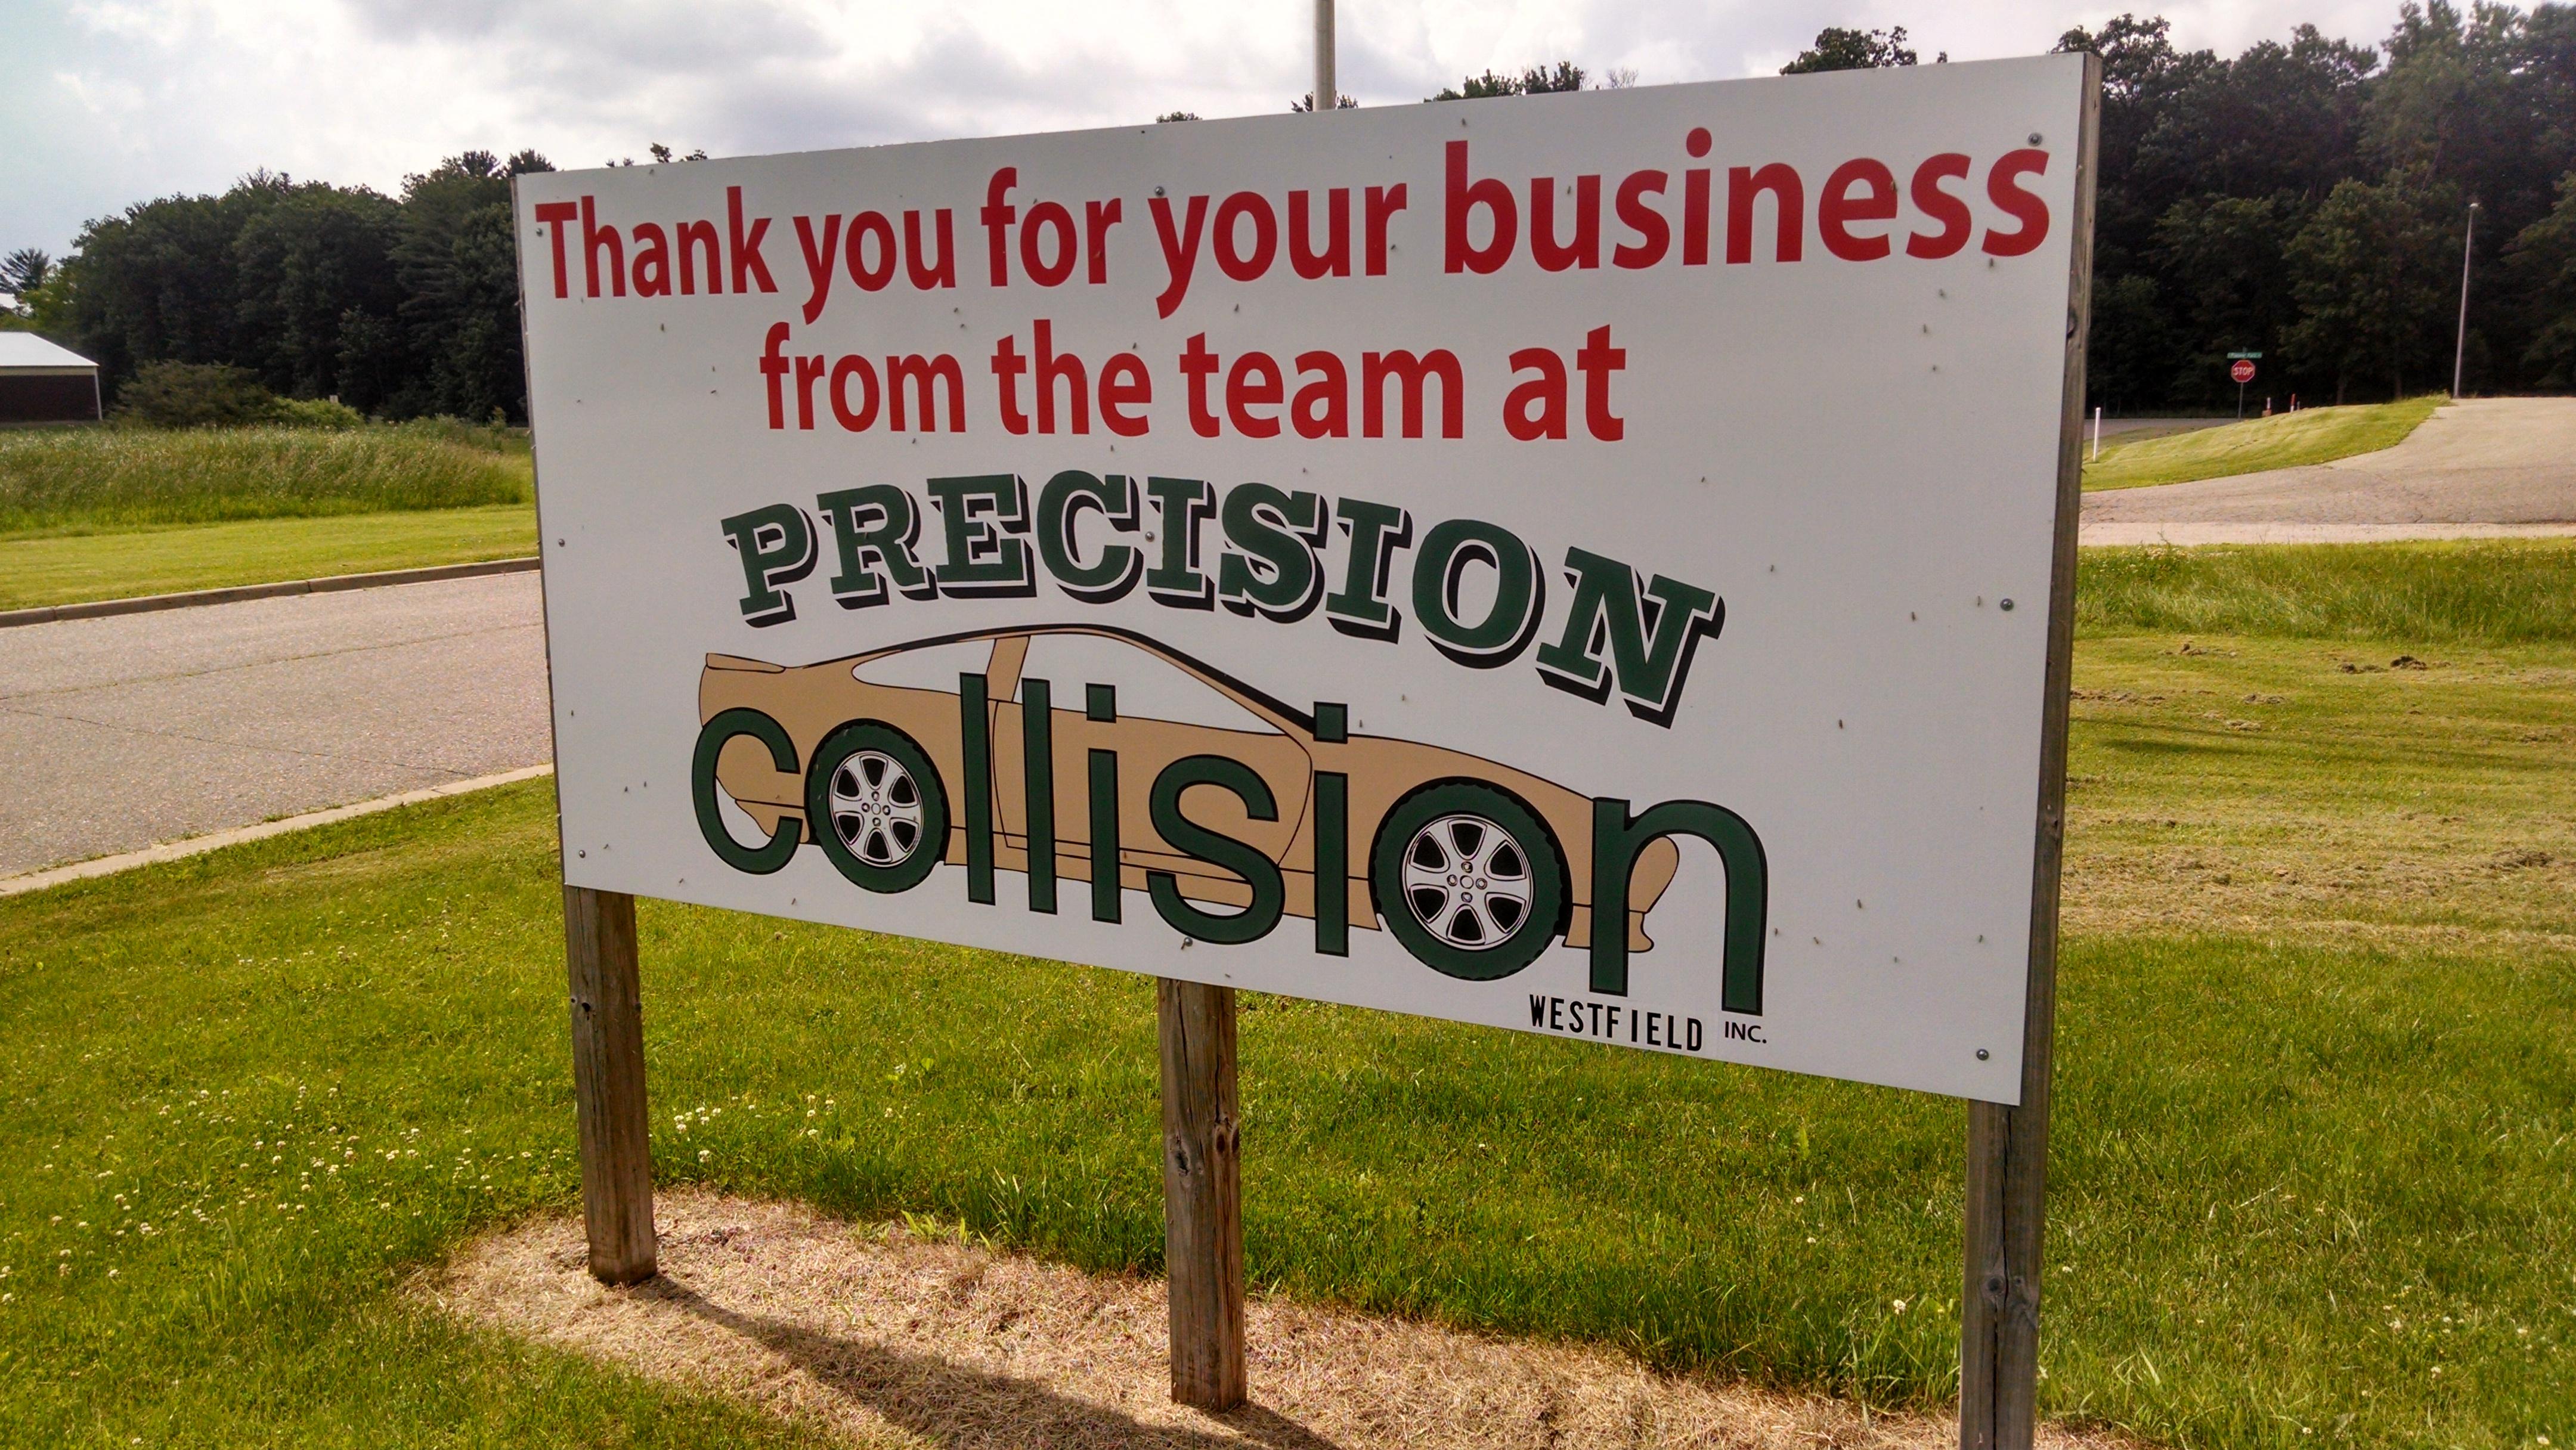 Precision Collision Inc., Westfield WI